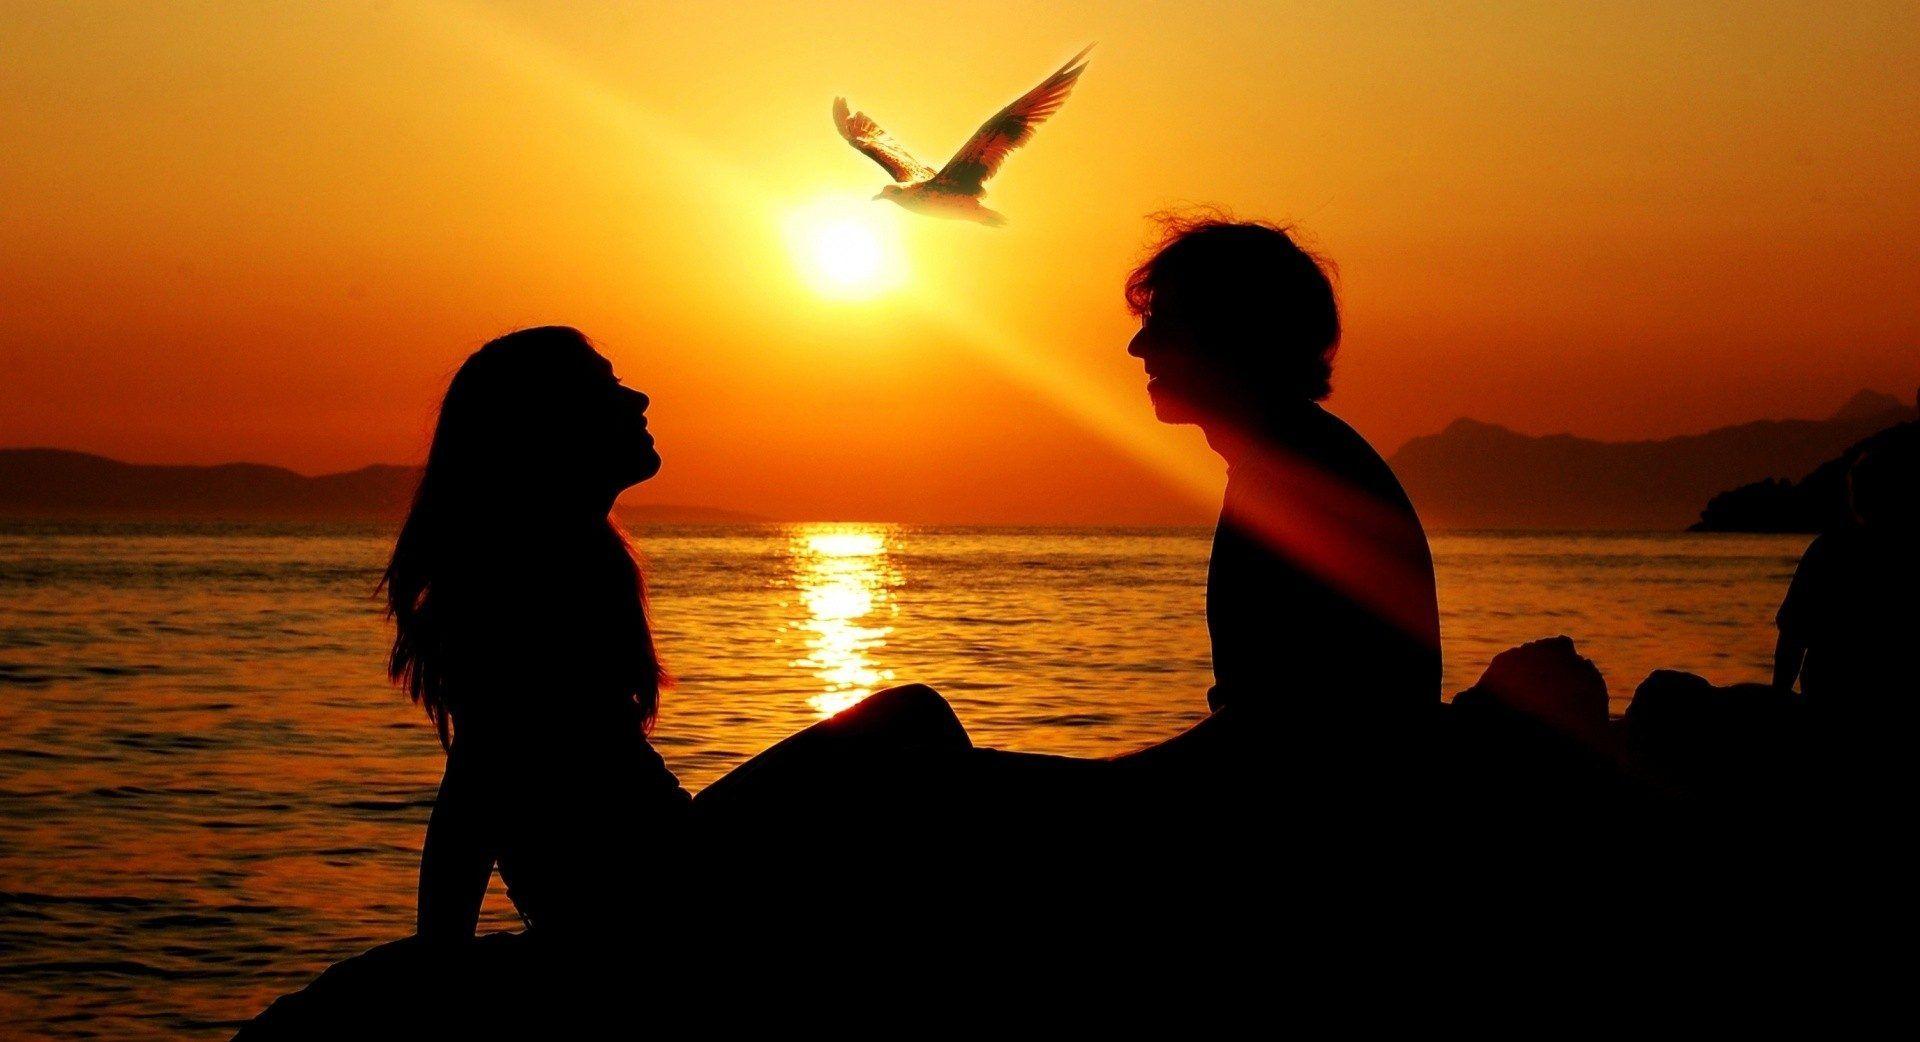 Natbg Com Lovers Enjoying Sunsets Nice Warm Free Desktop